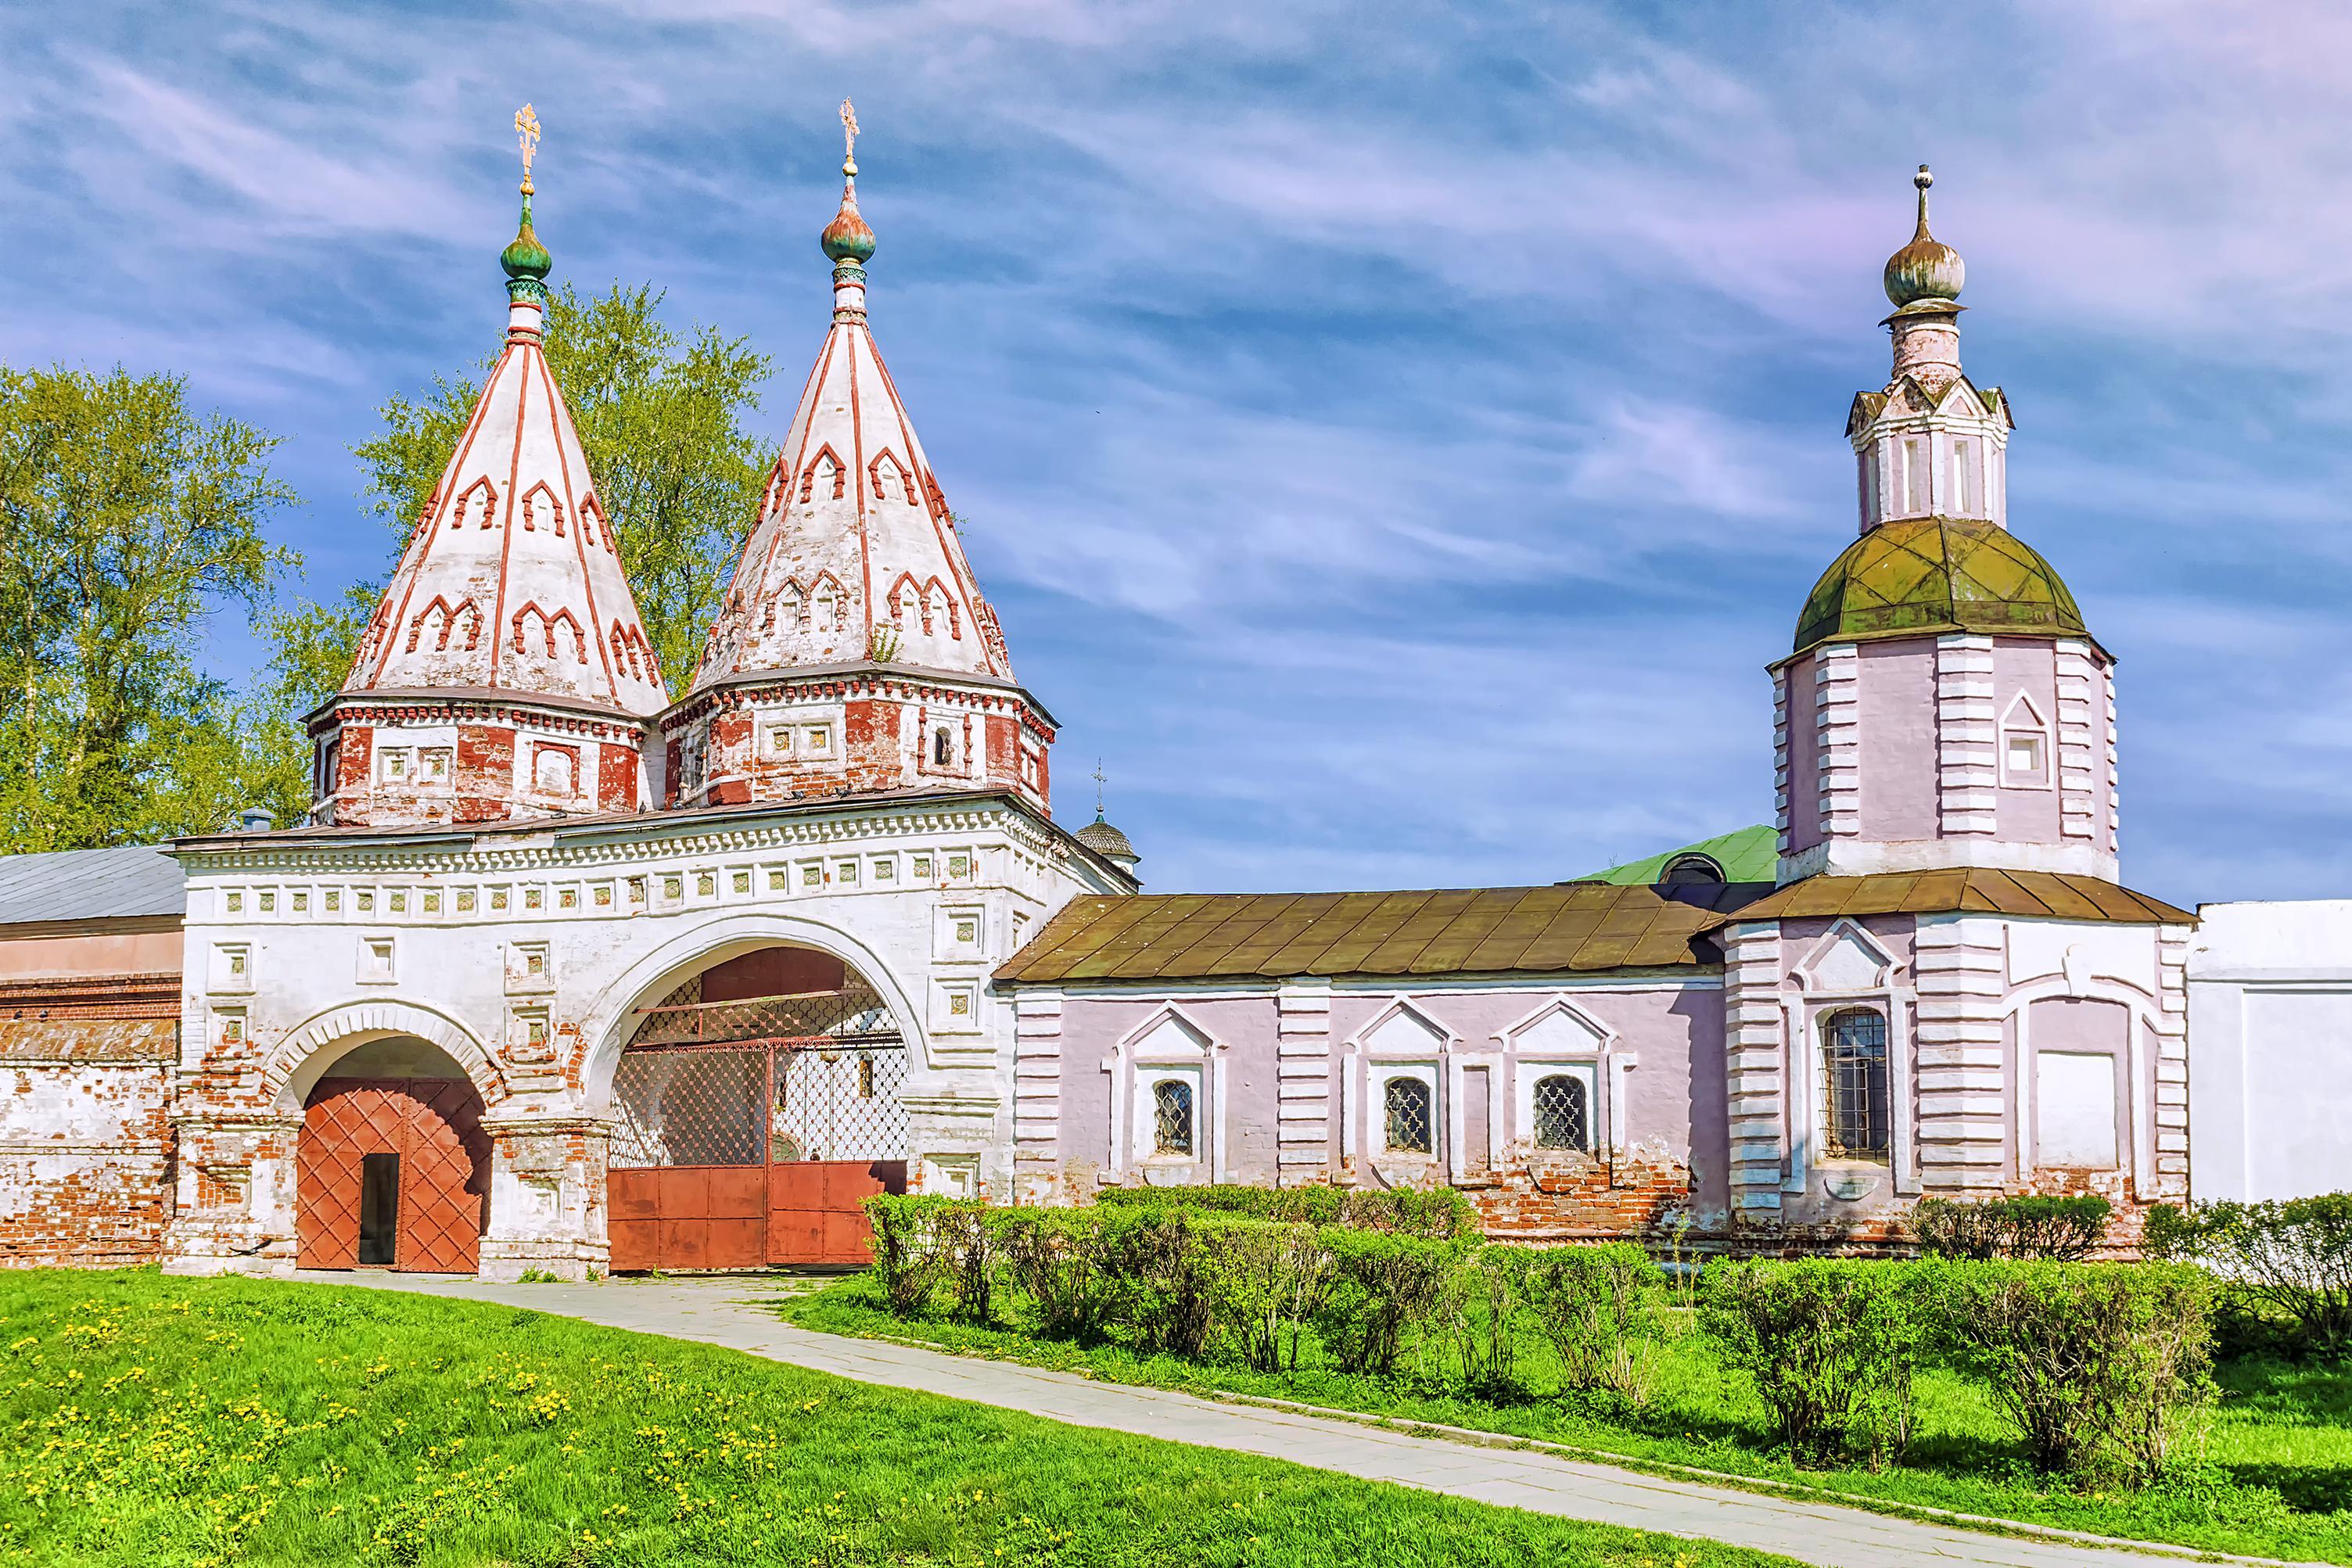 Rizopolozhenskaya convent in Suzdal